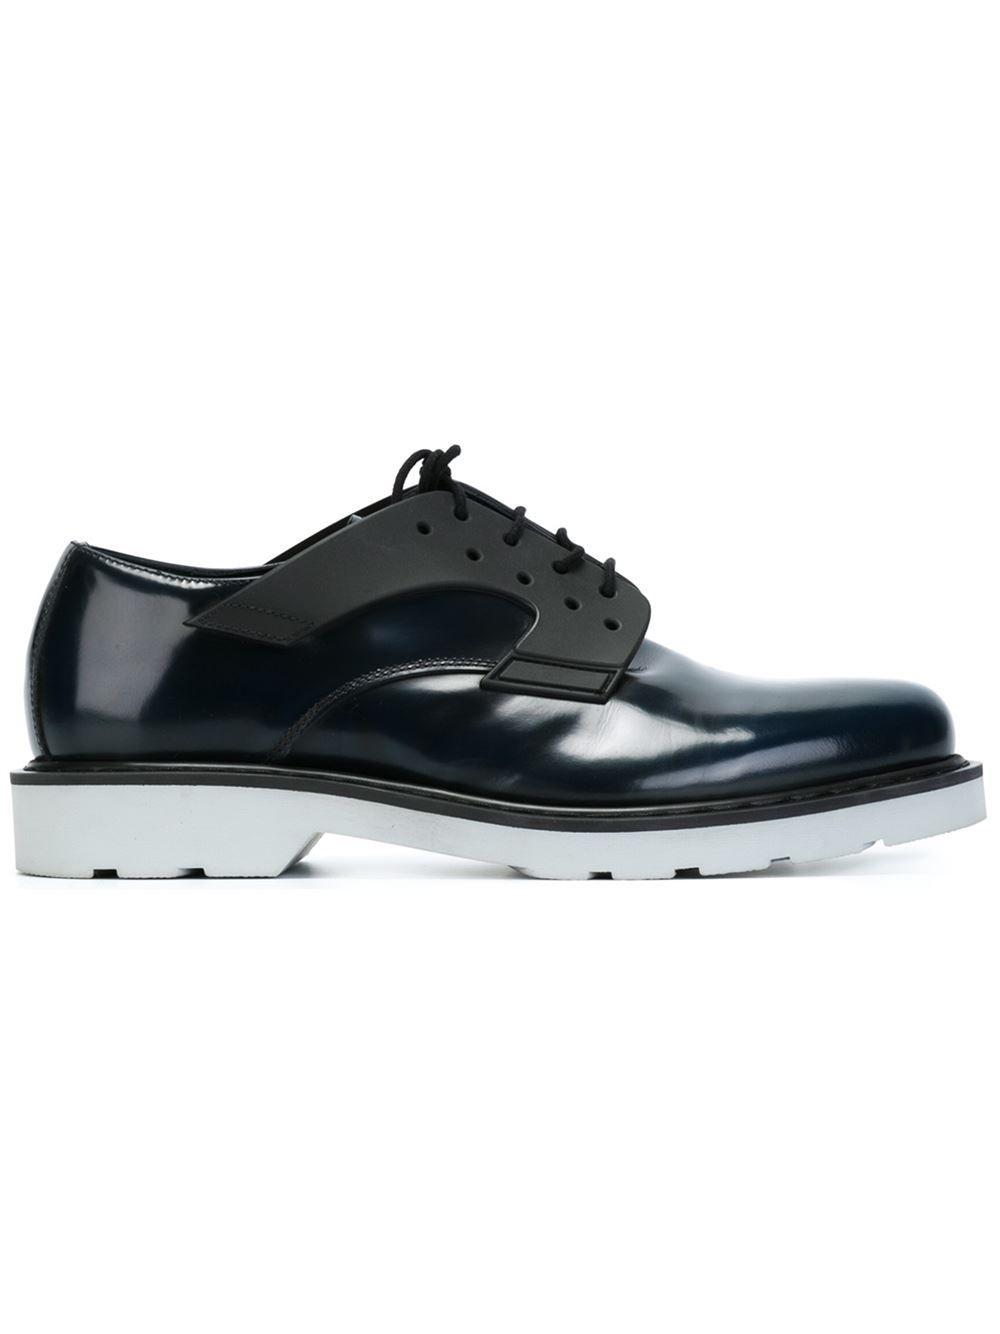 6def172375620 Alexander Mcqueen  harley  Derby Shoes - Luisa World - Farfetch.com